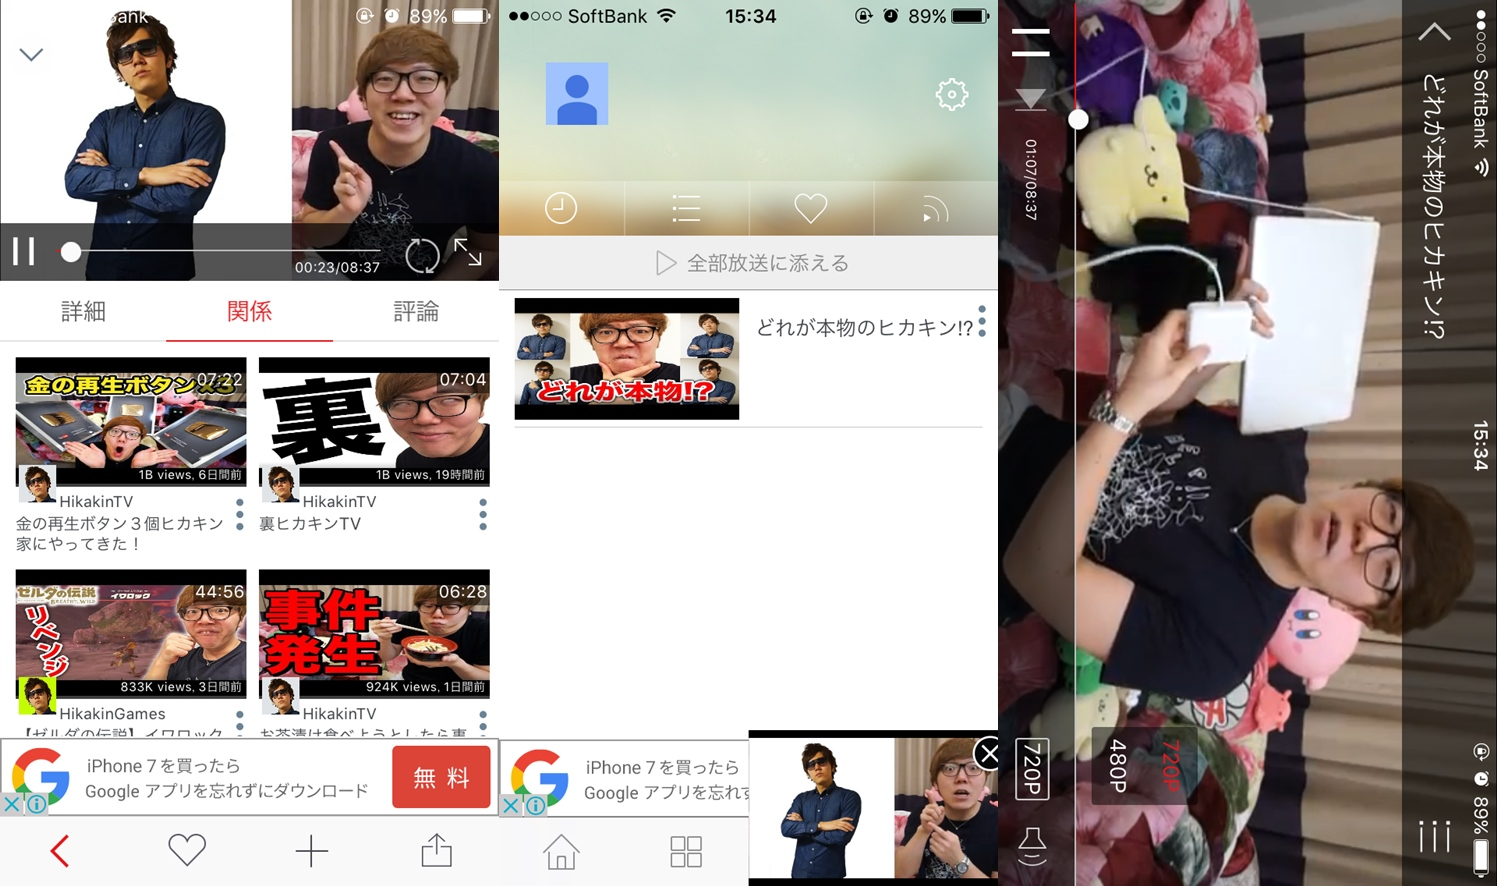 Youtube公式アプリと同じように現在再生中の動画を右下の小窓に表示ができるアプリです。